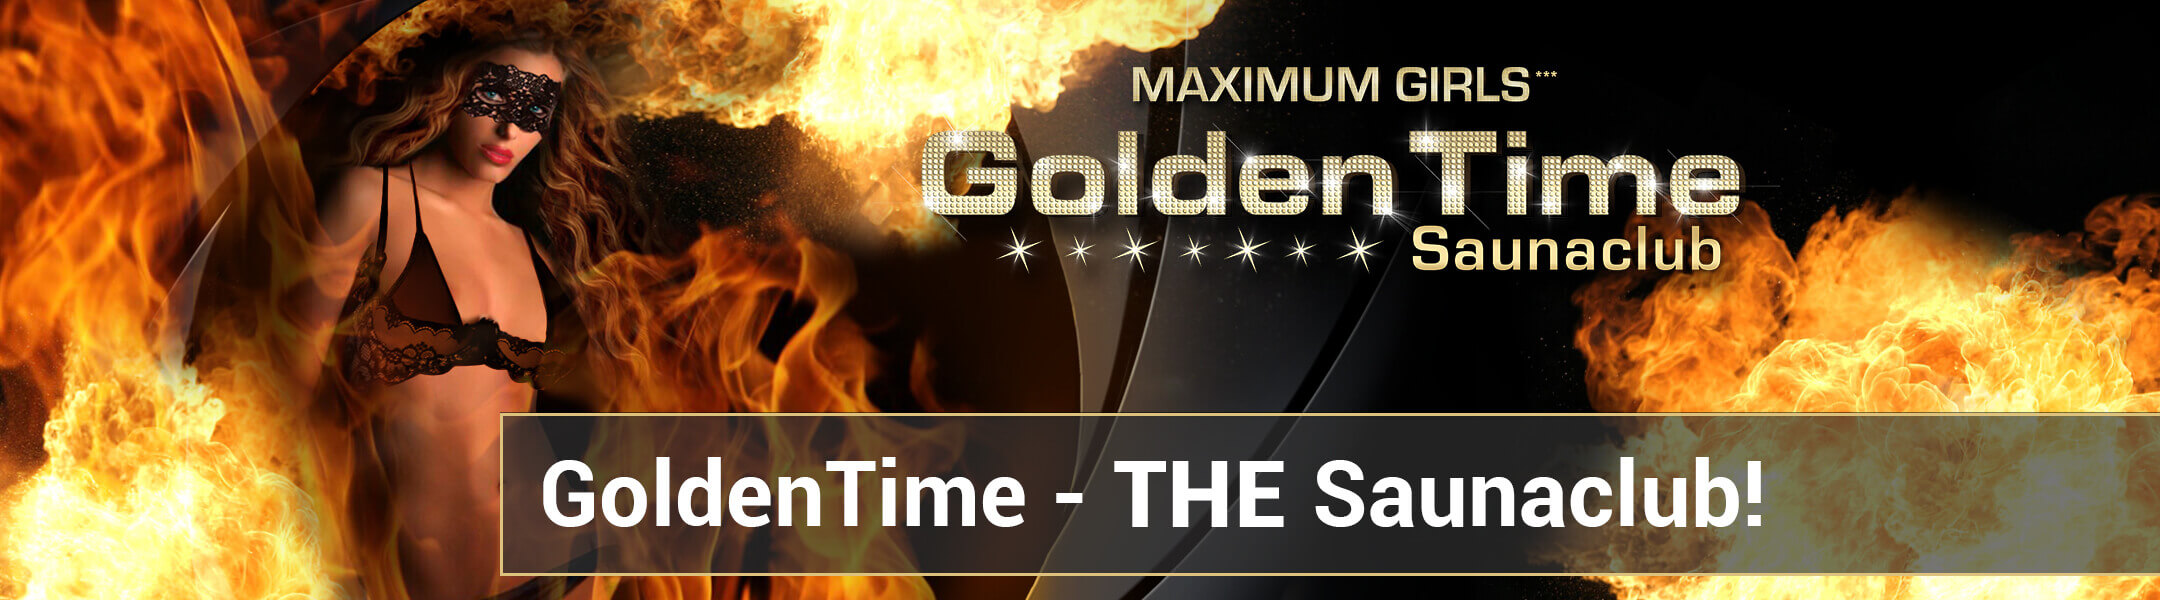 GoldenTime - THE Nudist Saunaclub